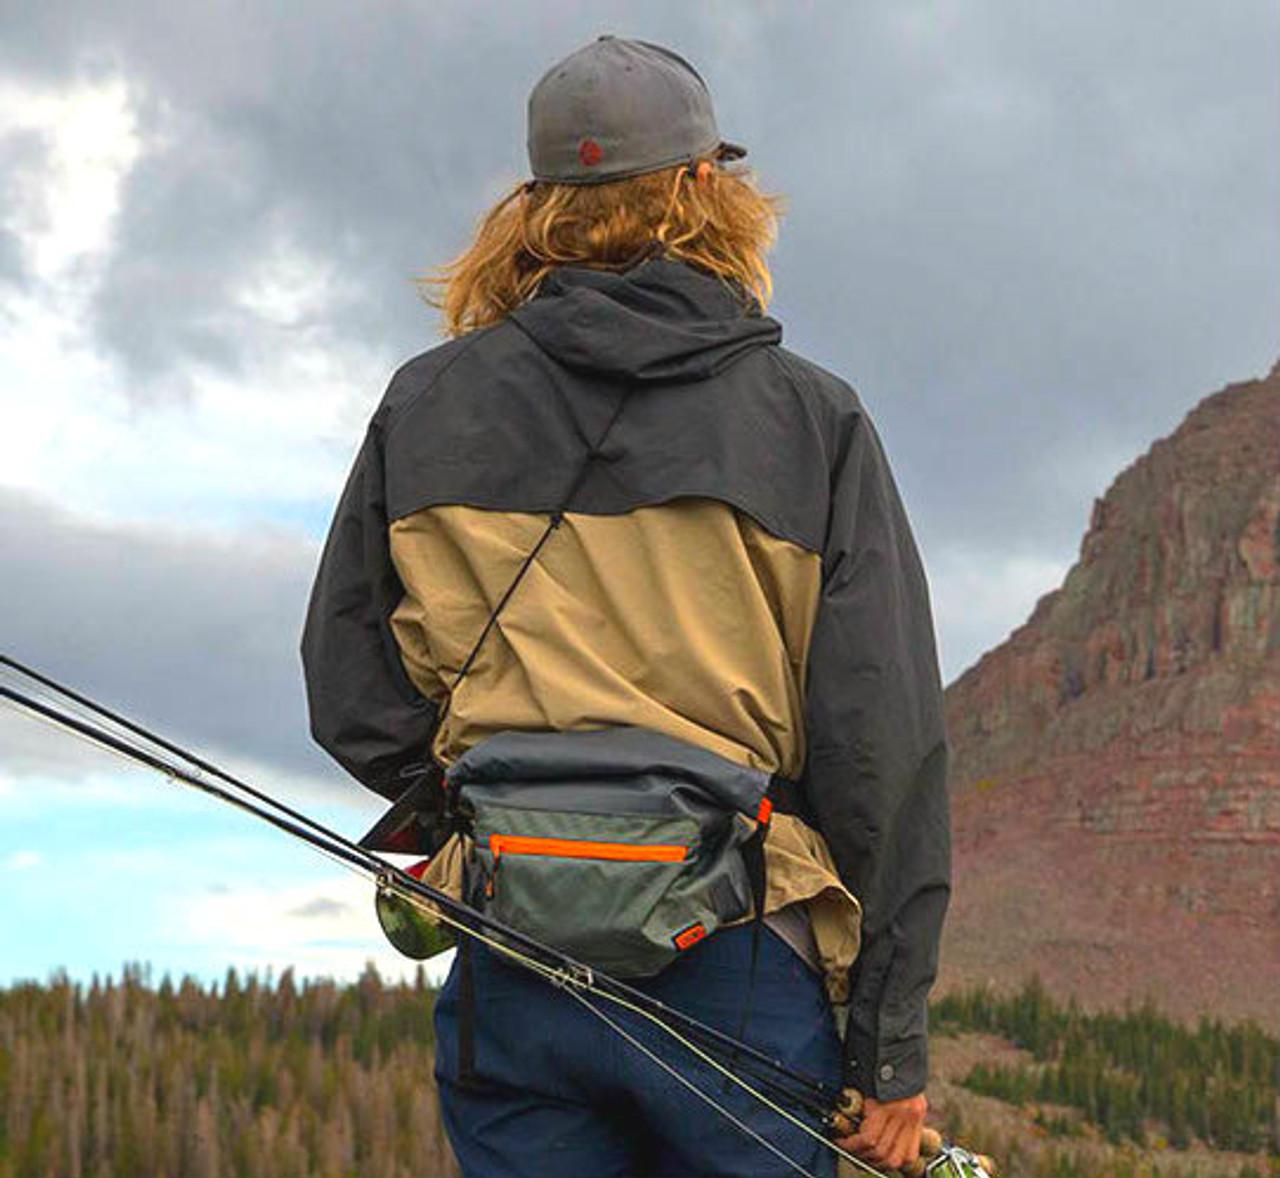 Waterproof Waist and Shoulder Pack | Downriver 7 Liter | Chums